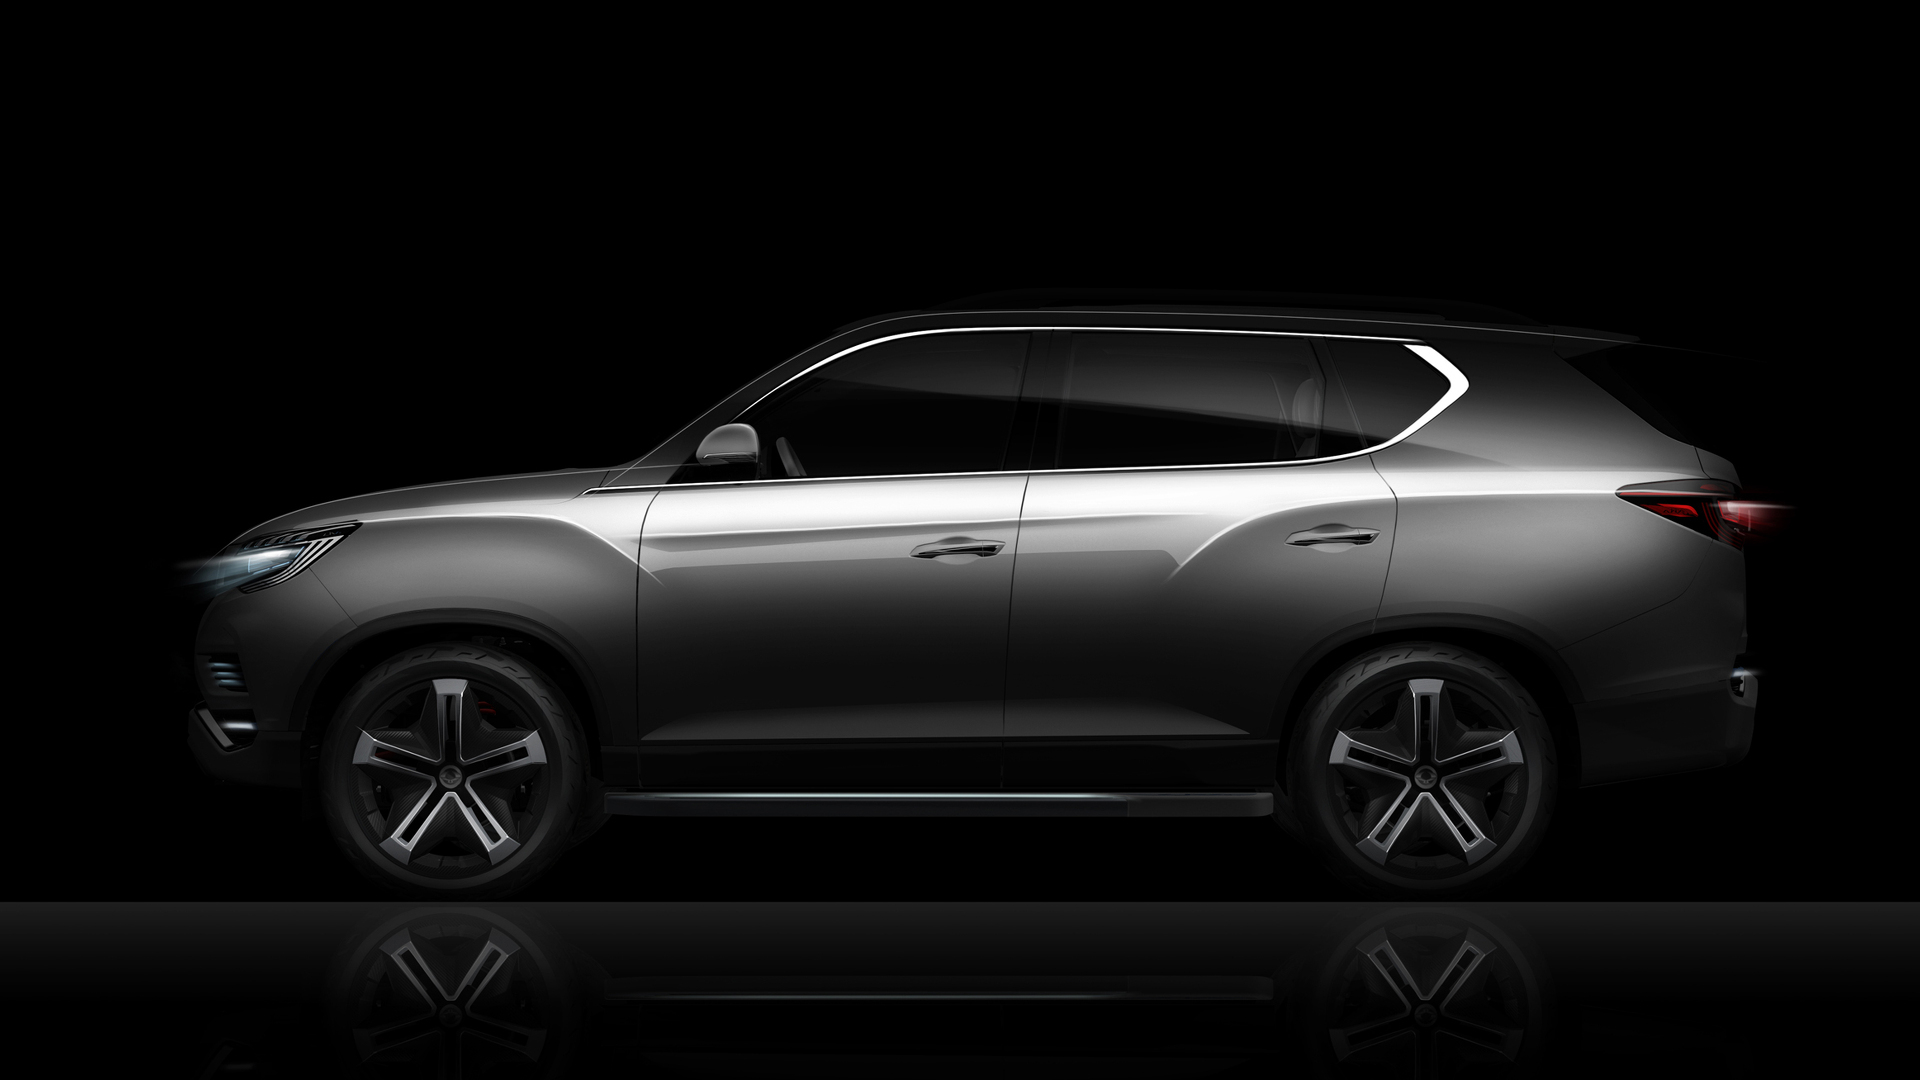 SsangYong LIV-2 SUV concept previewed before Paris | PerformanceDrive